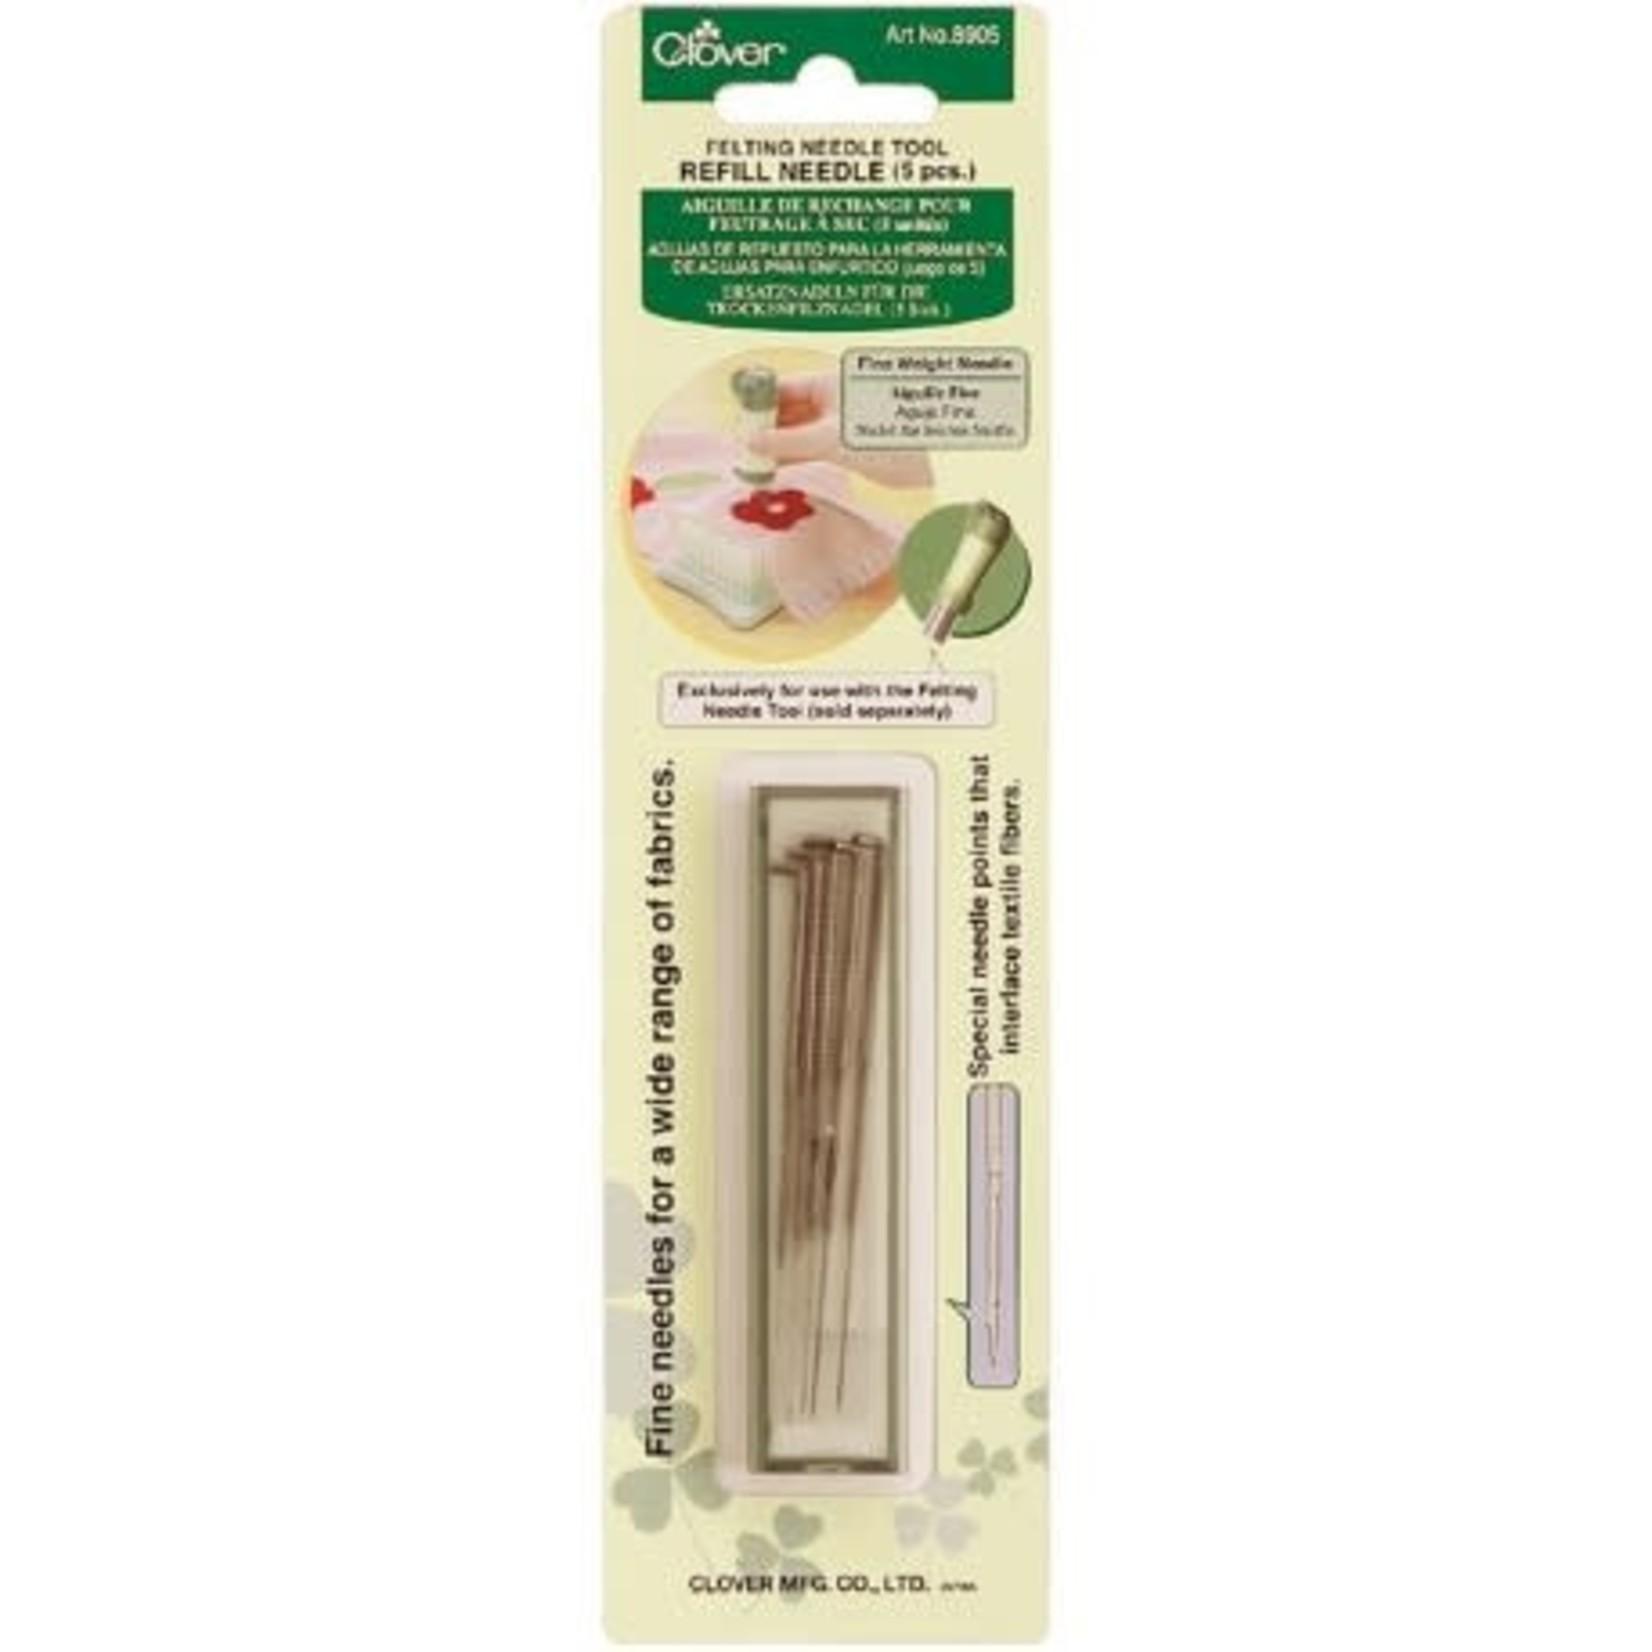 Clover Needle Felting Tool Refill Needle (5ps)